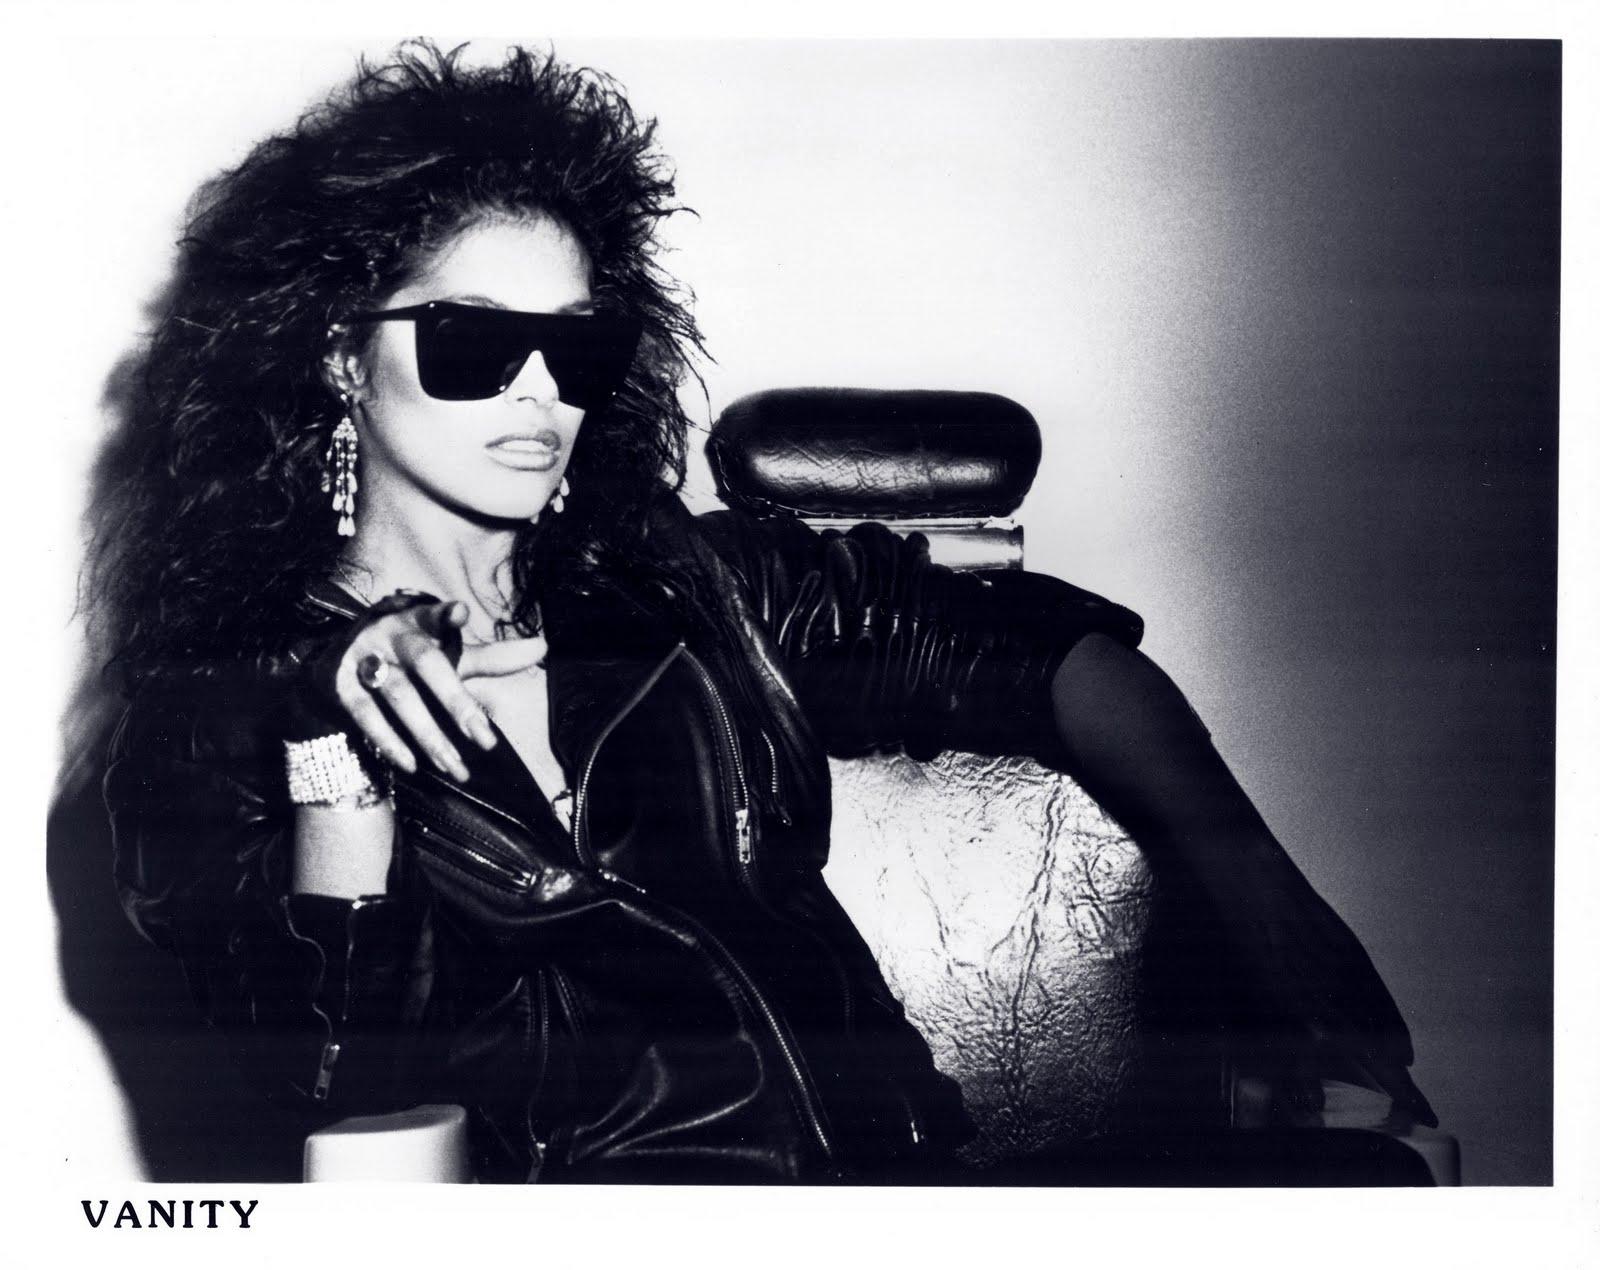 Image Result For Vanity Singer Nikki Sixx